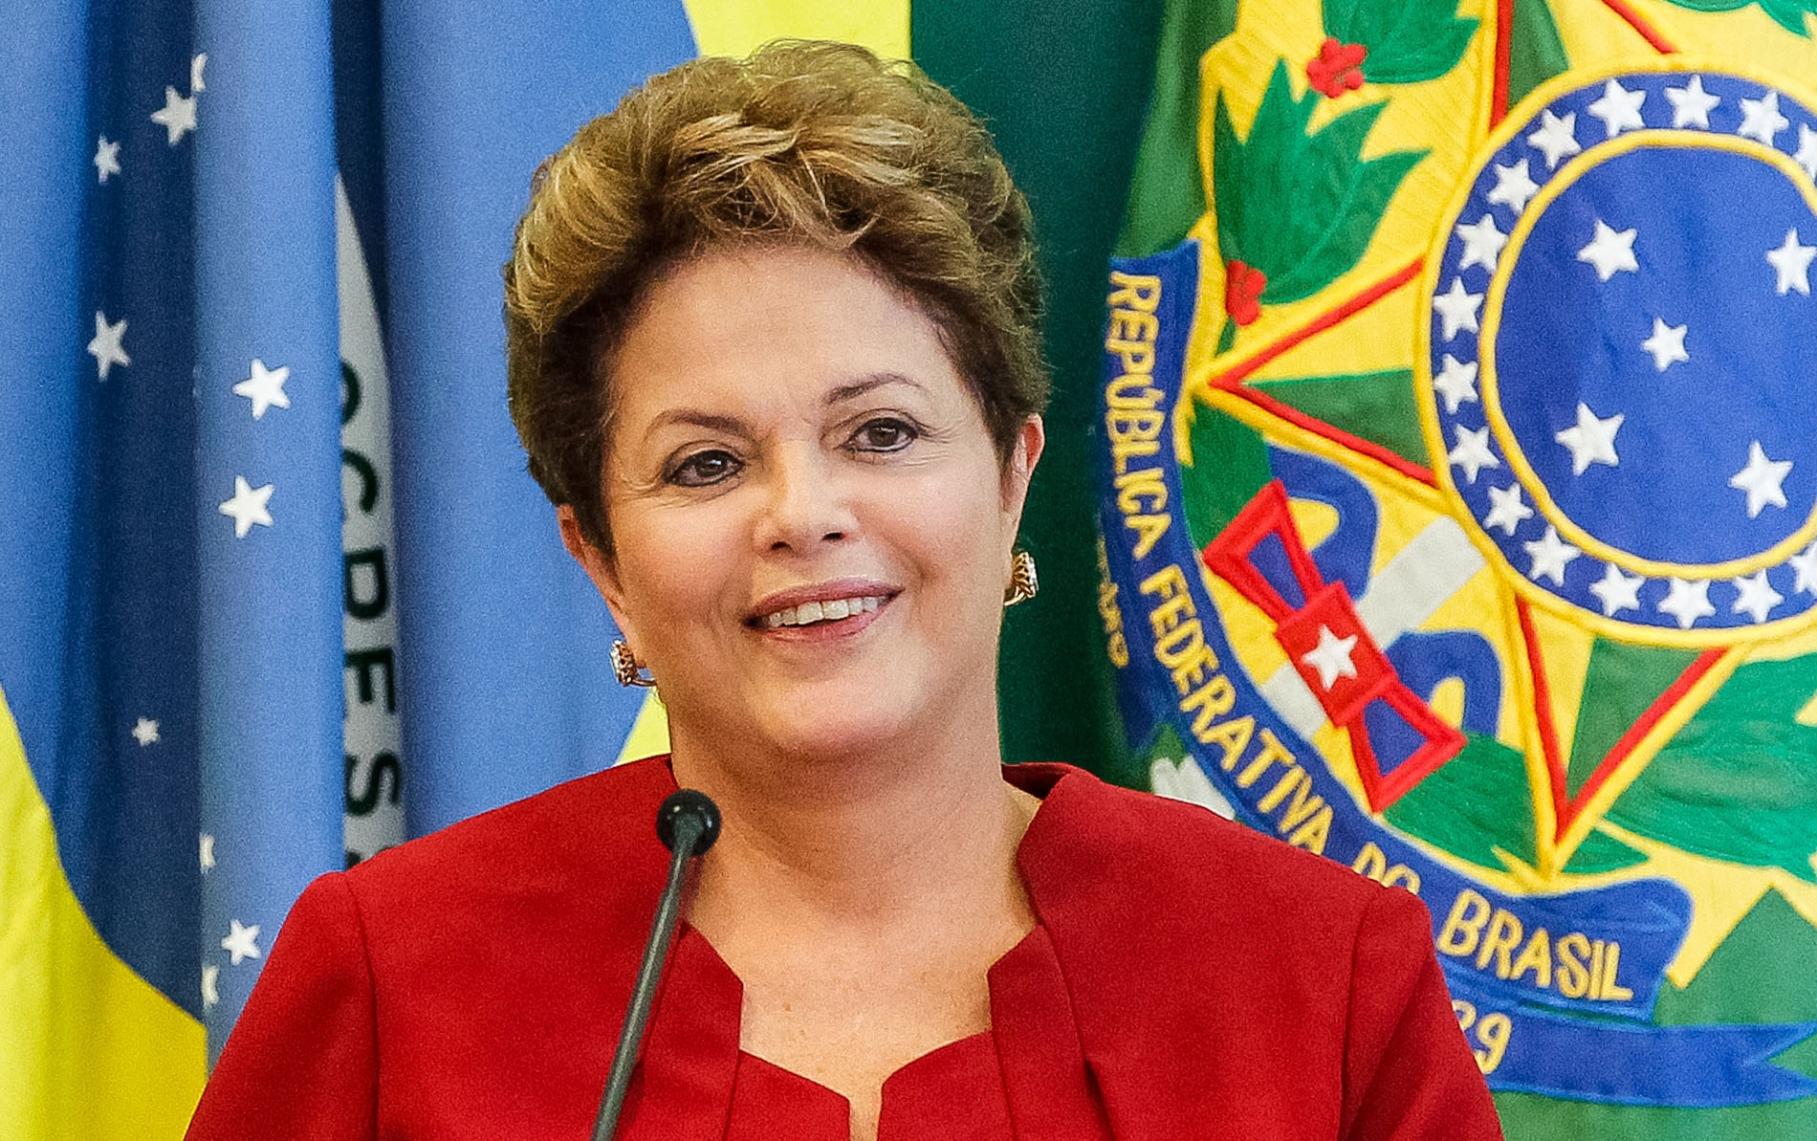 Zika: ricercatori brasiliani, trovato virus in saliva e urina